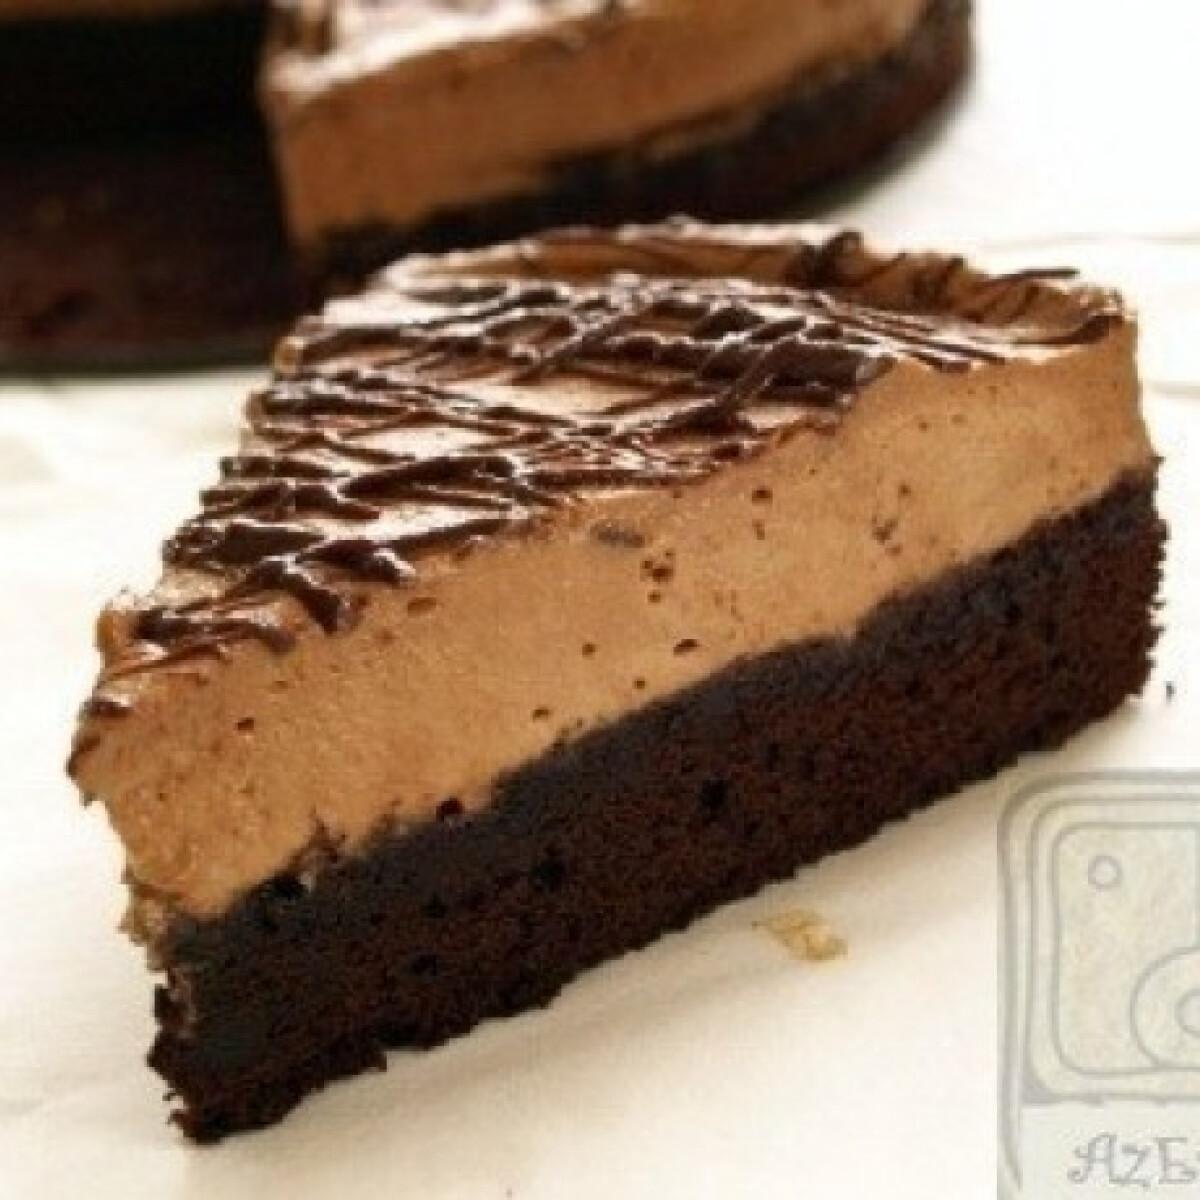 Ezen a képen: Nutella mousse-os brownie torta- a 9. főbűn